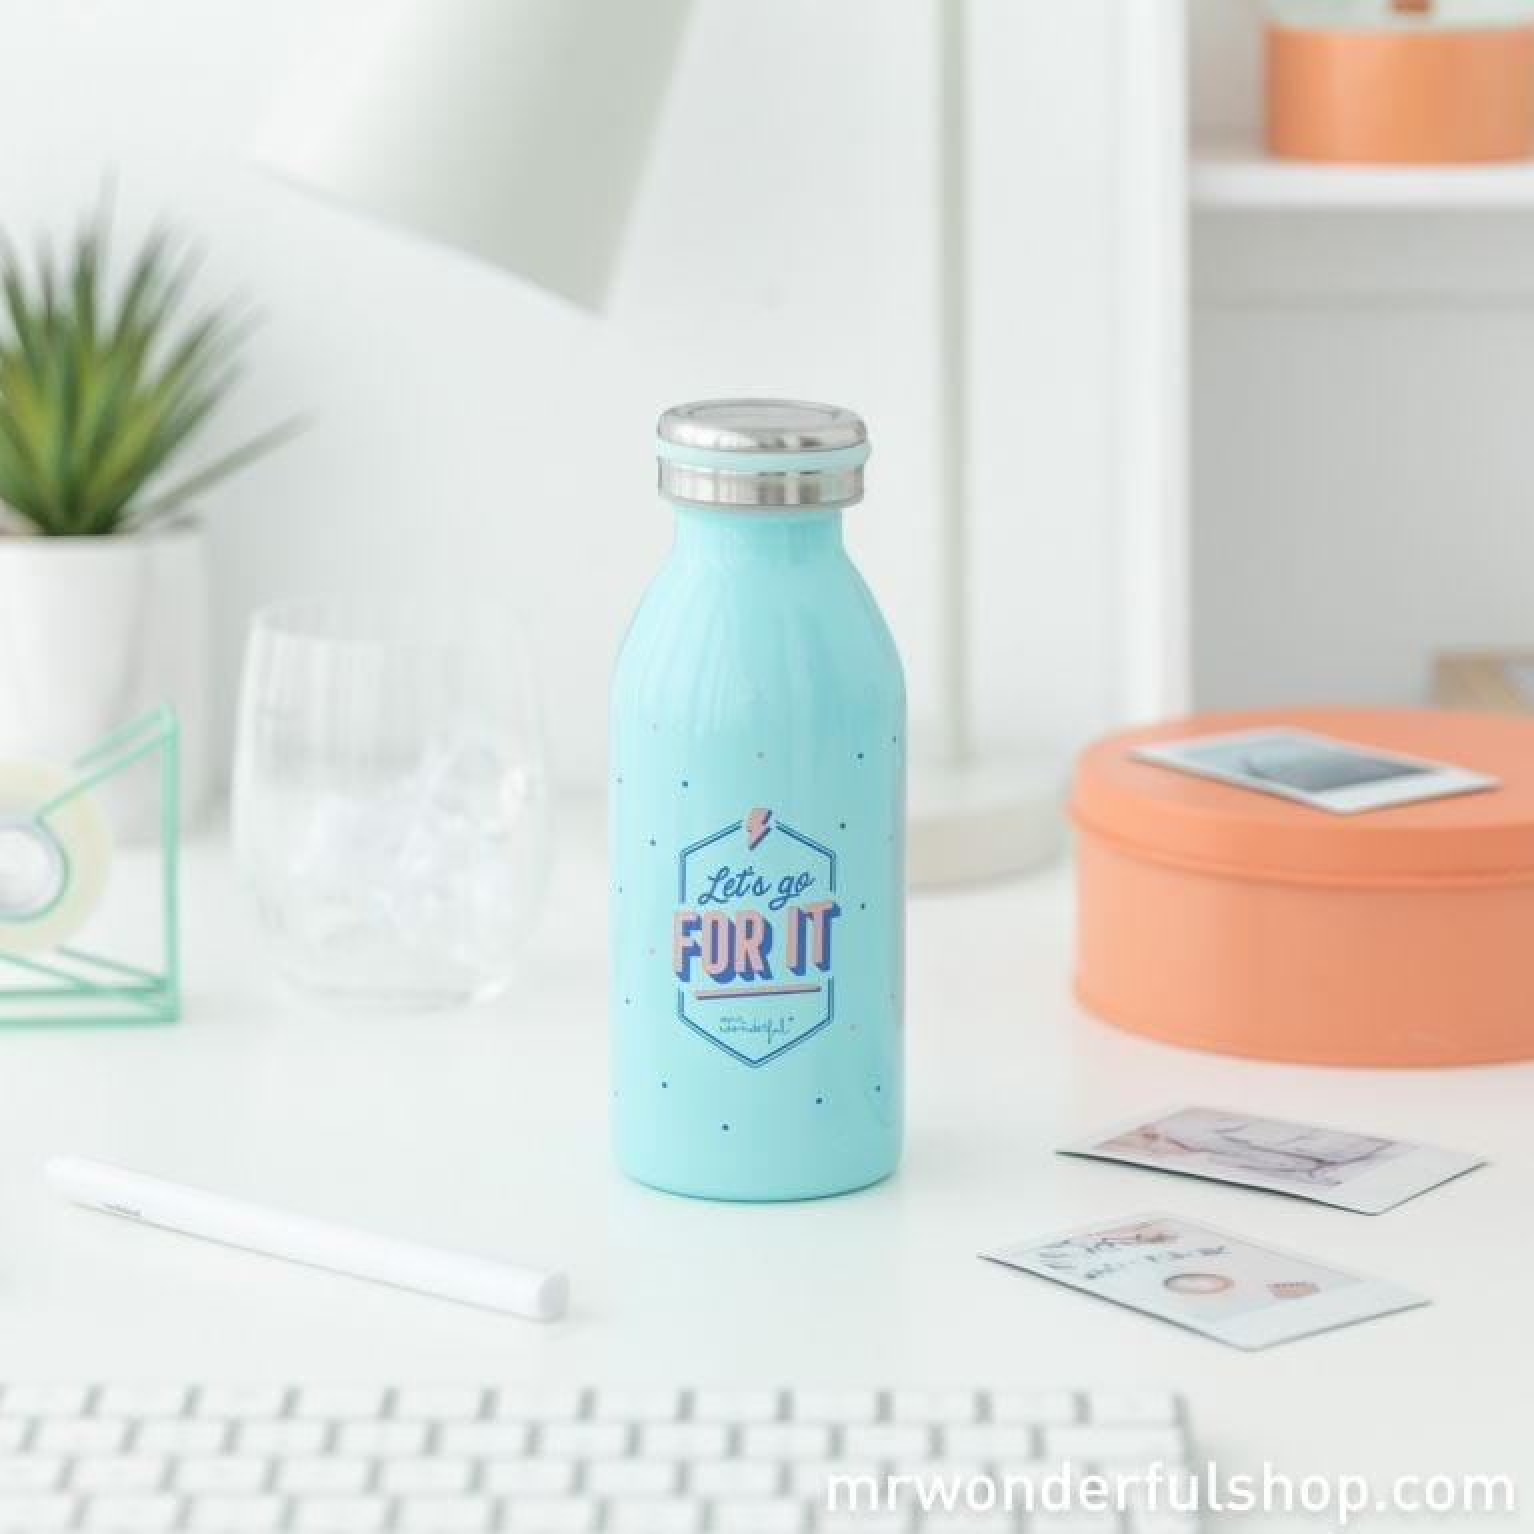 Bottle - Let's go for it